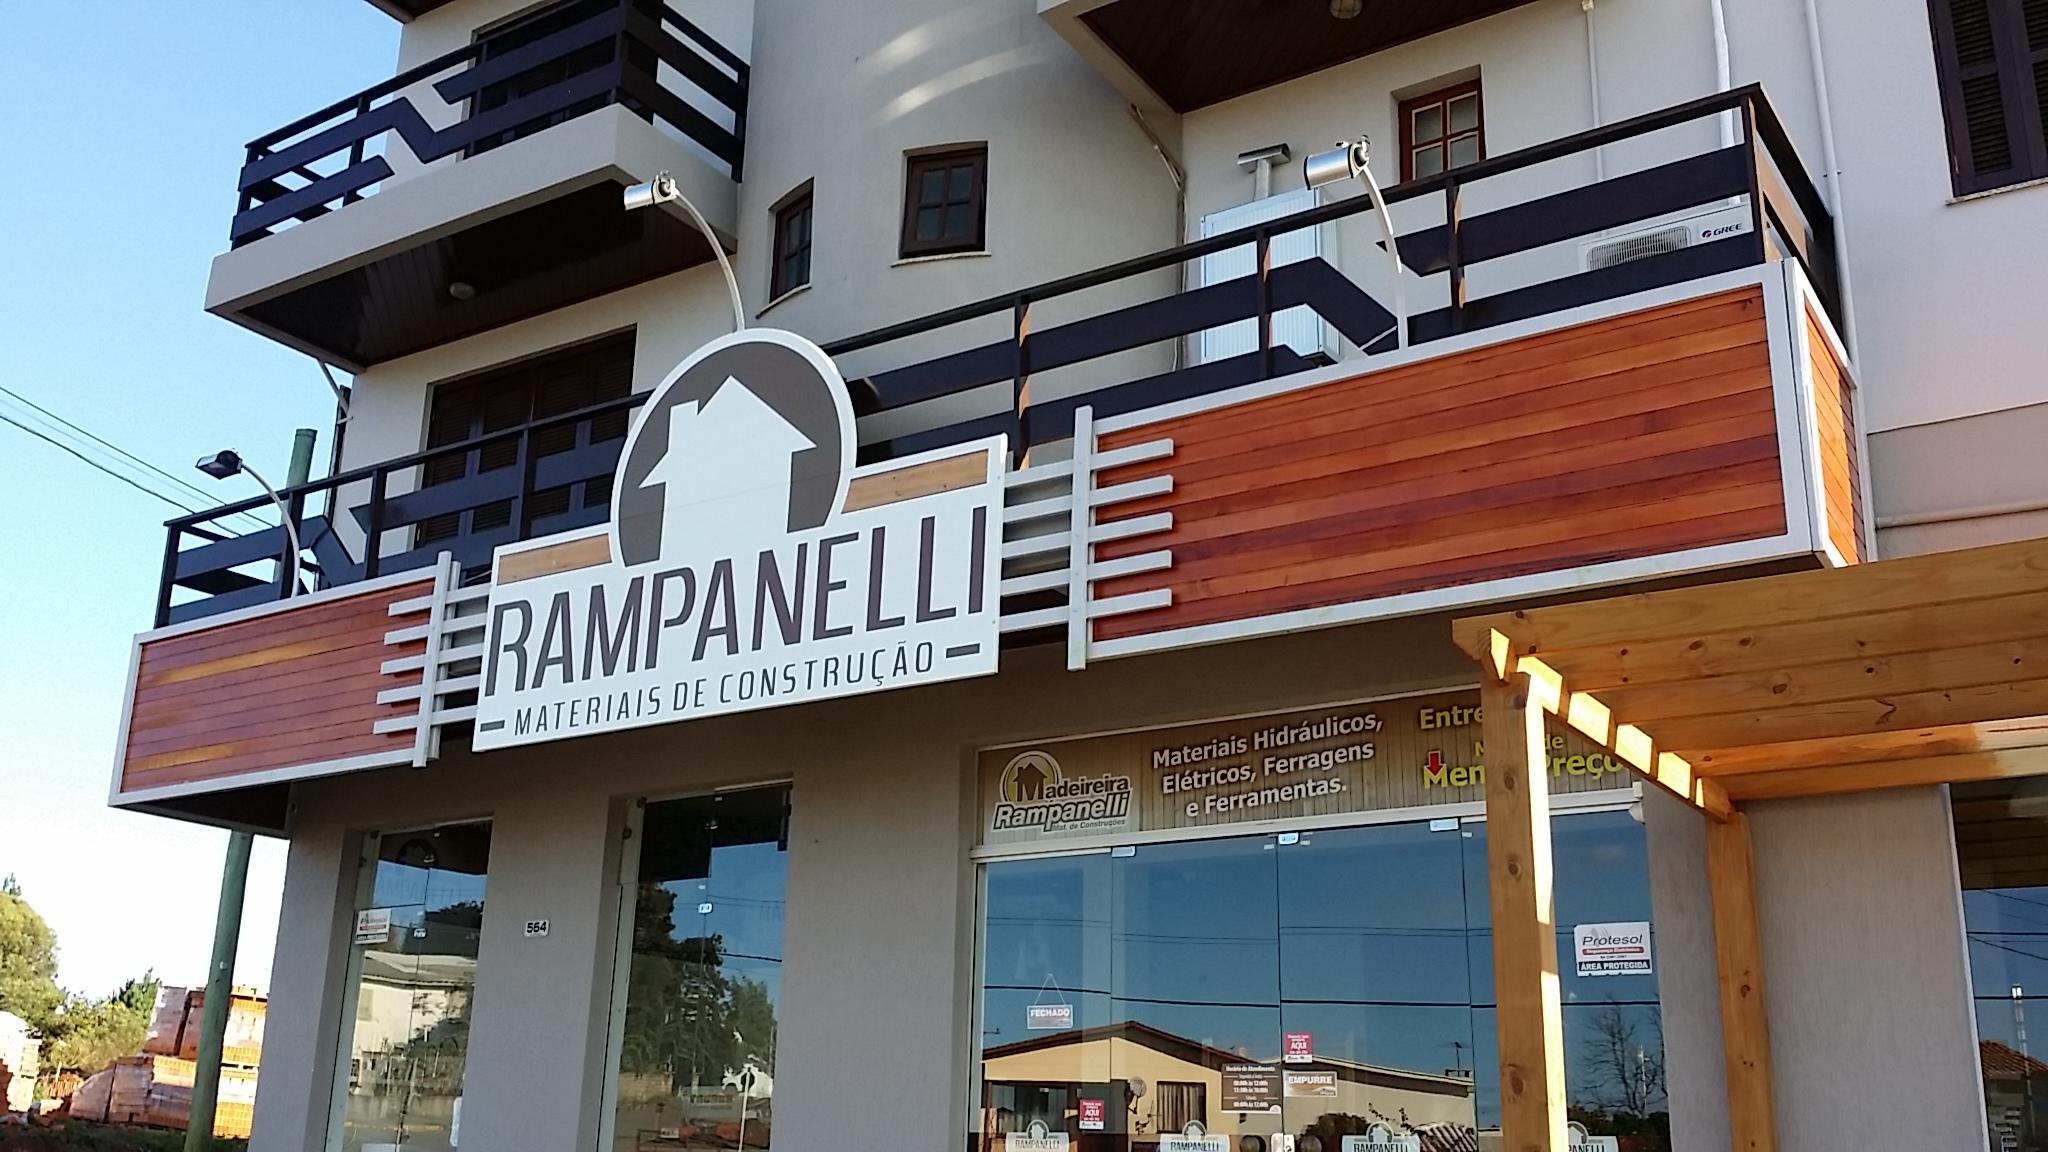 Rampanelli 1